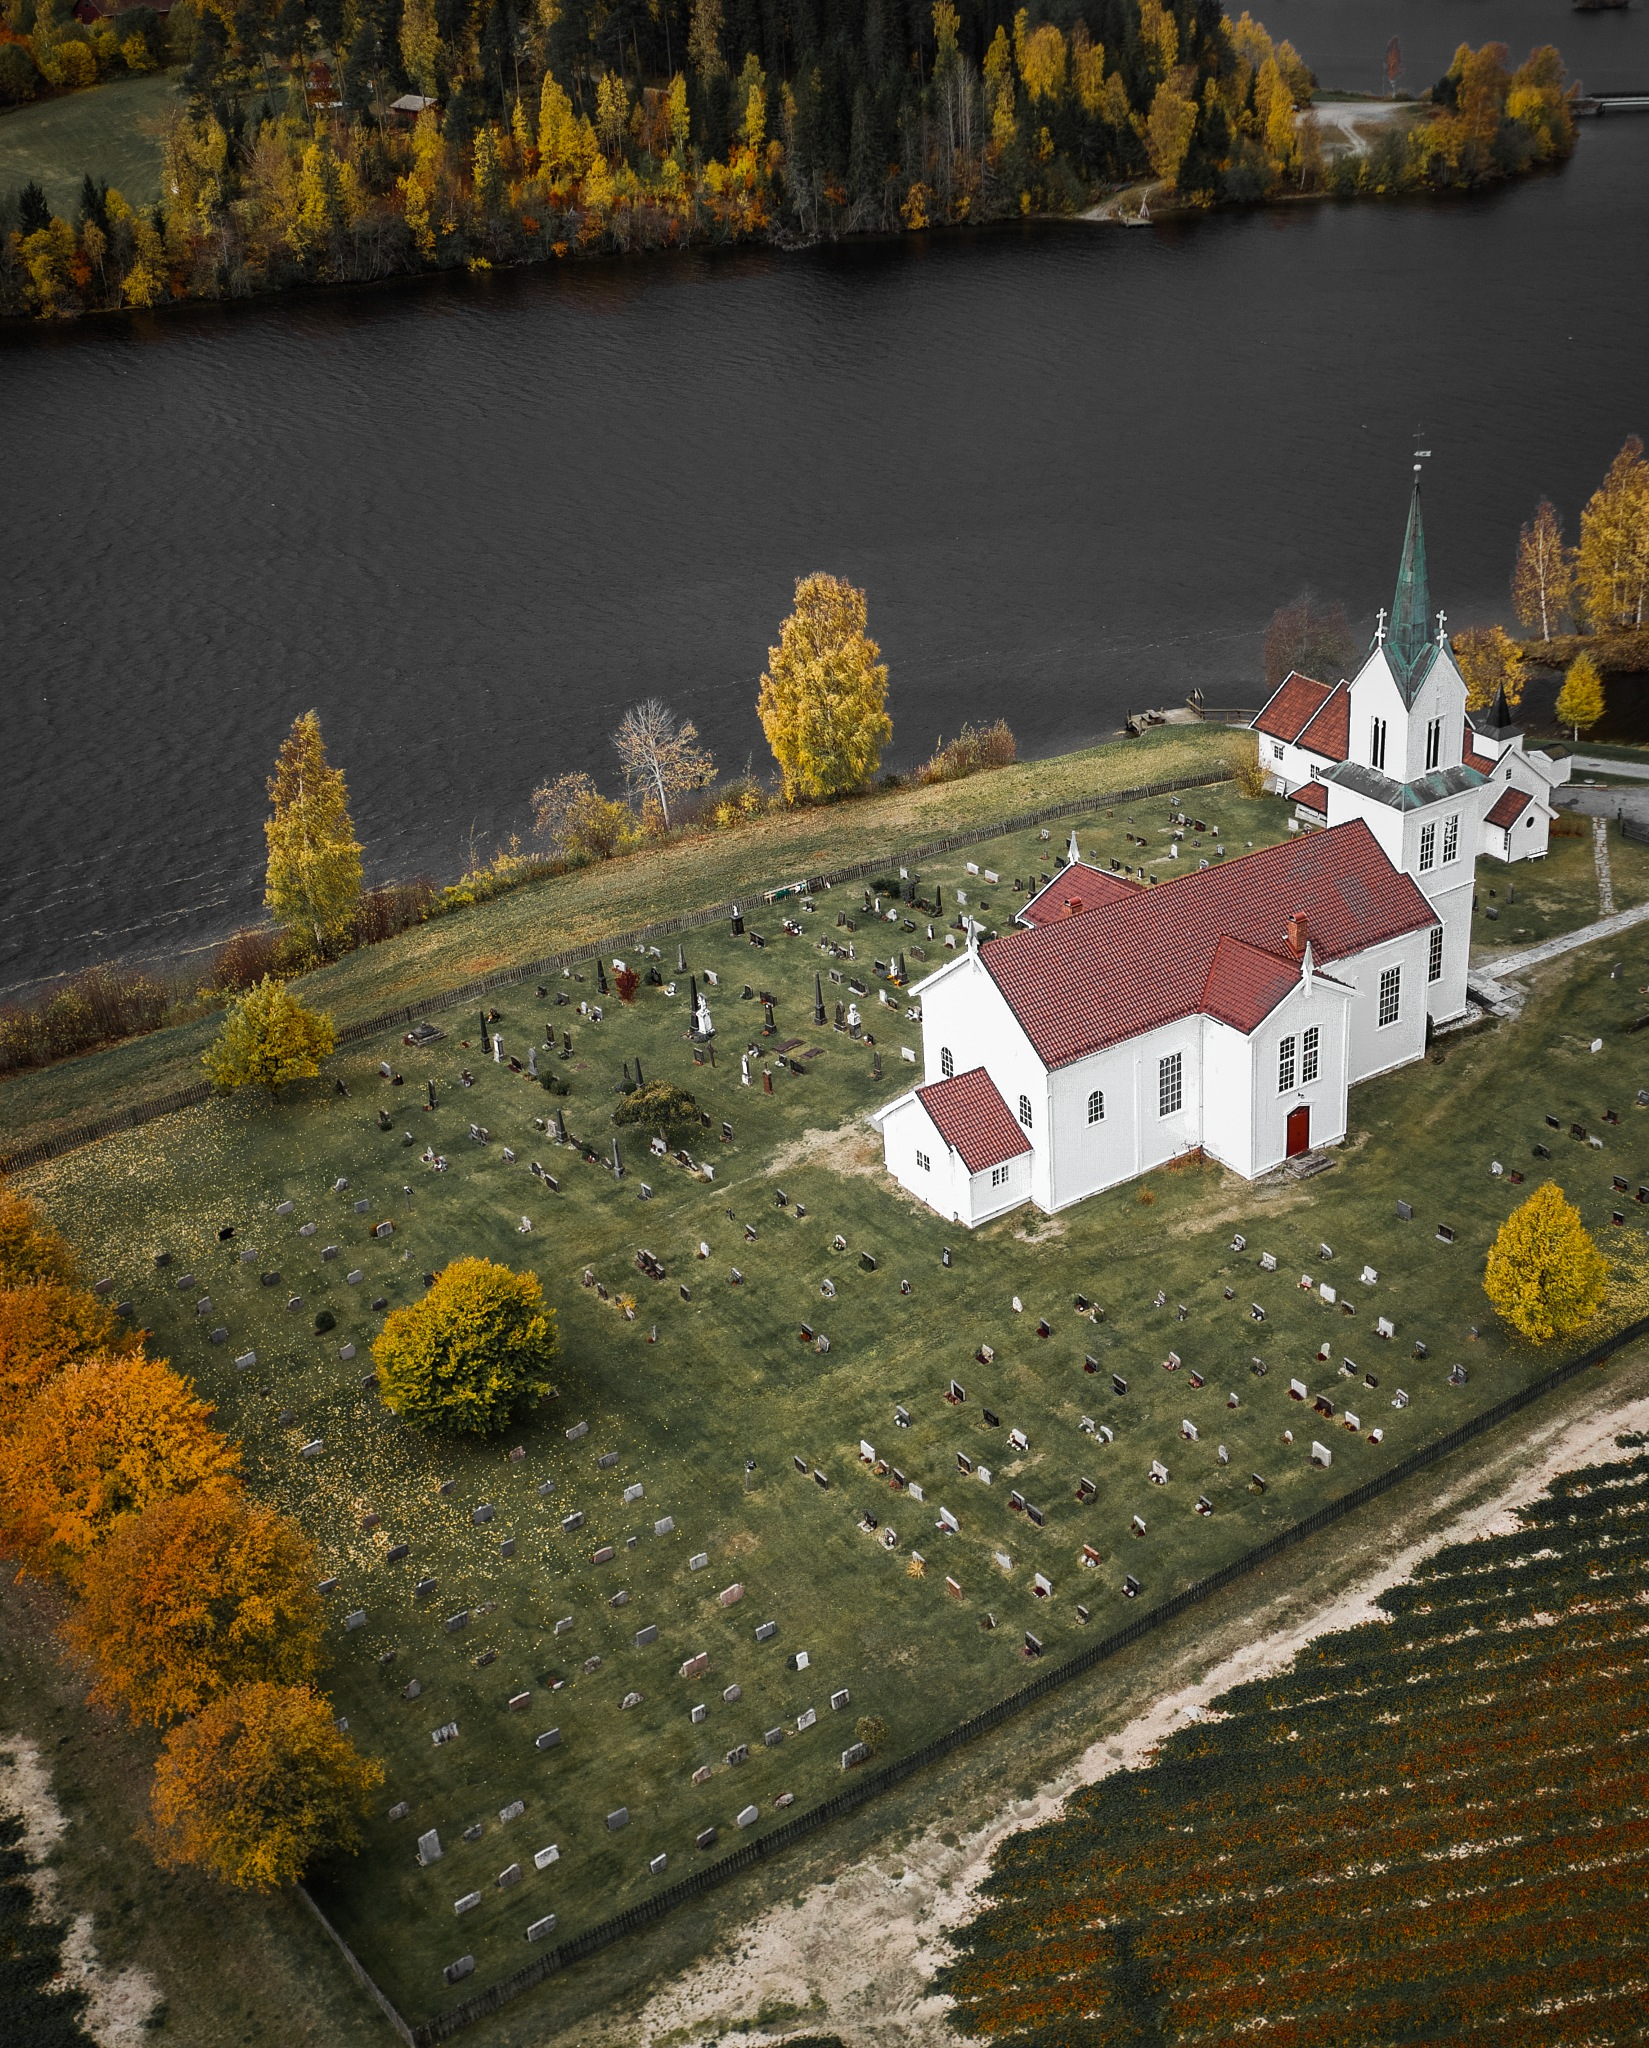 Norwegian church in beautiful autumn colors by Ole-Kristian Sverre